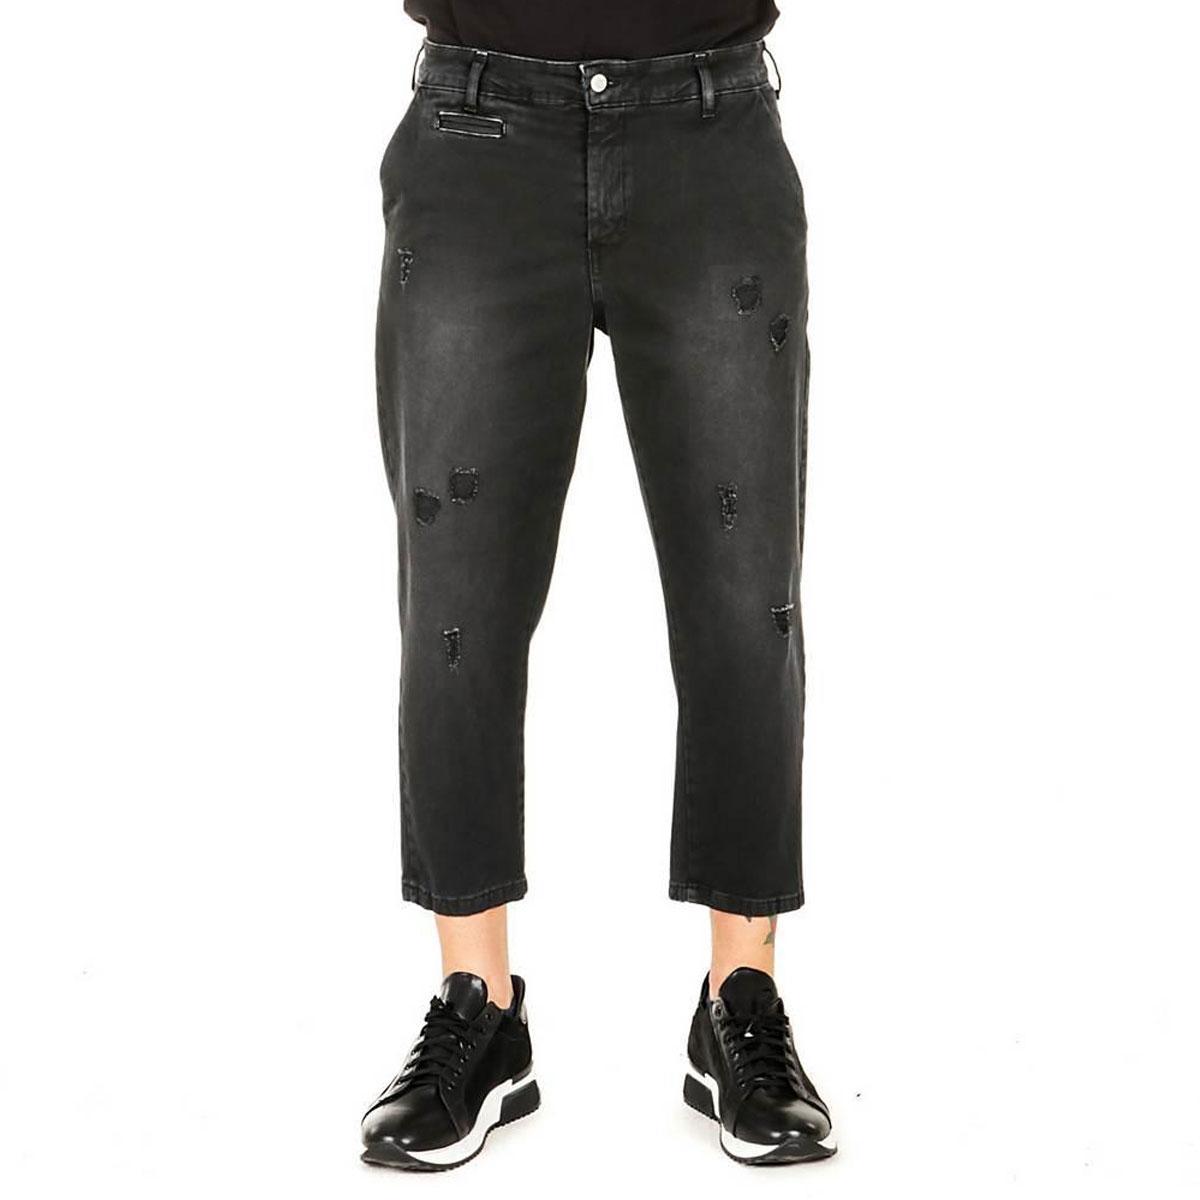 Pantaloni Over-d con strappi sulle gambe capri fit da uomo rif. OM529PN